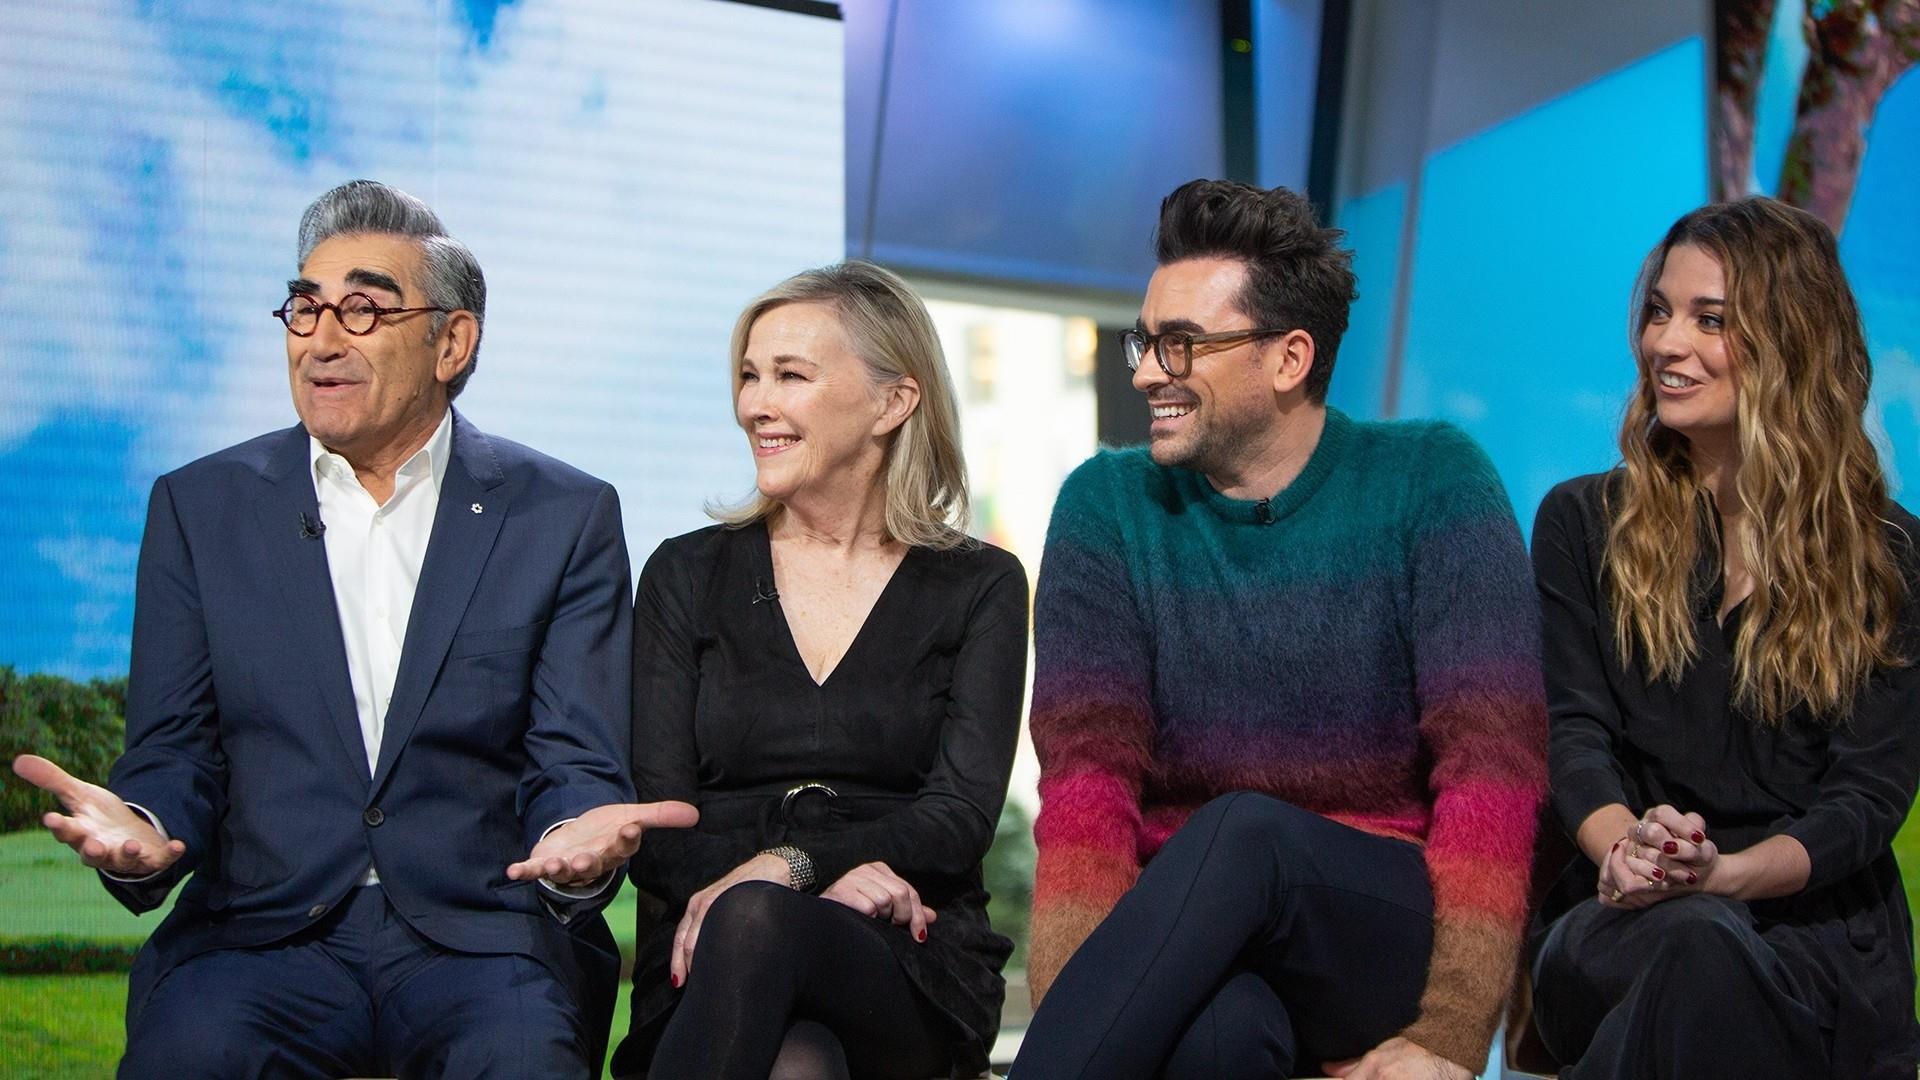 'Schitt's Creek' stars dish on the hit comedy's 5th season